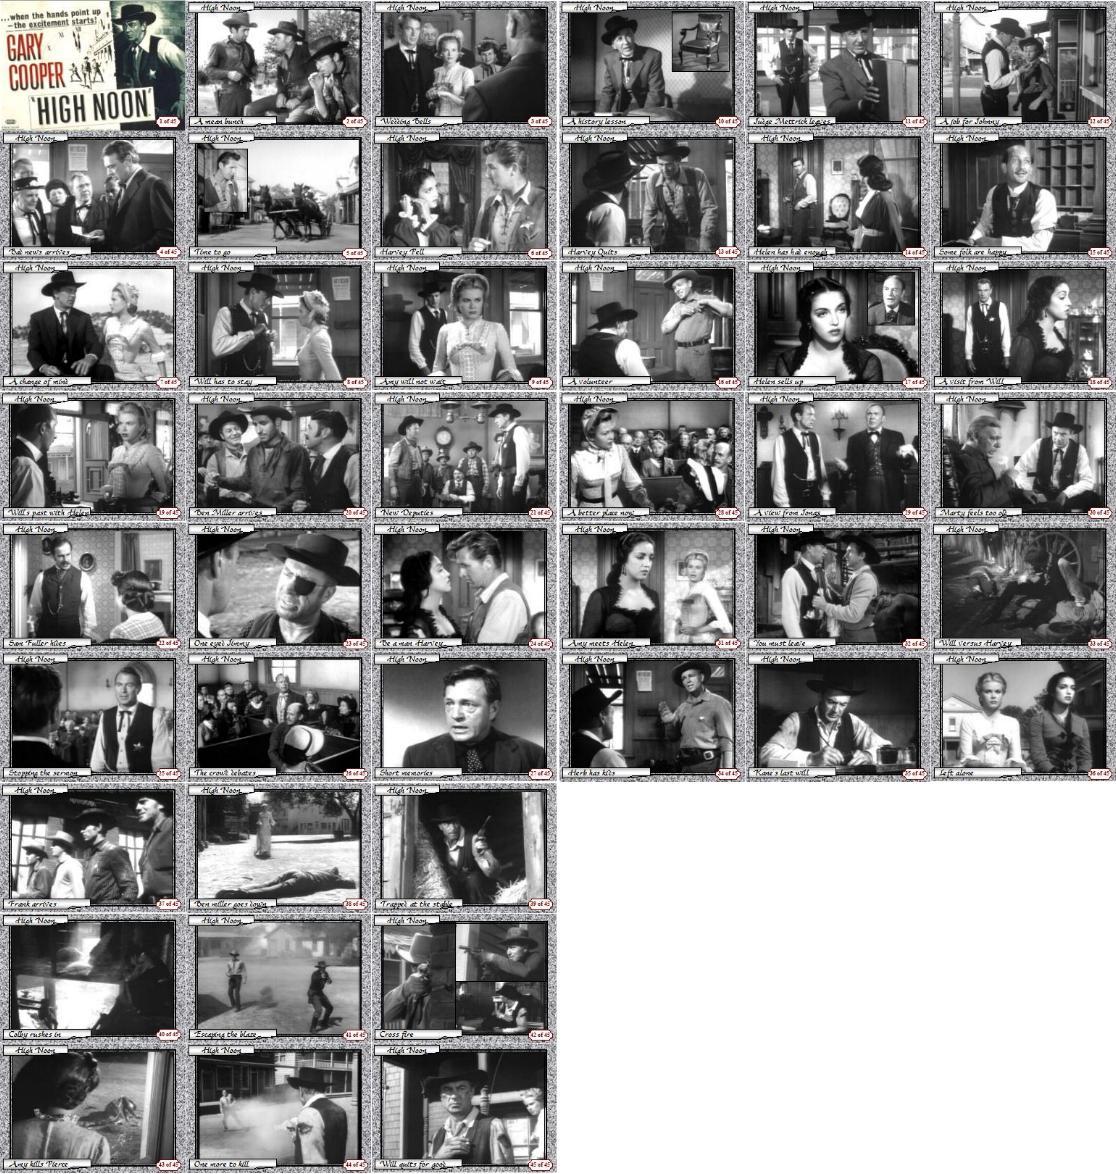 high noon 1952 full movie